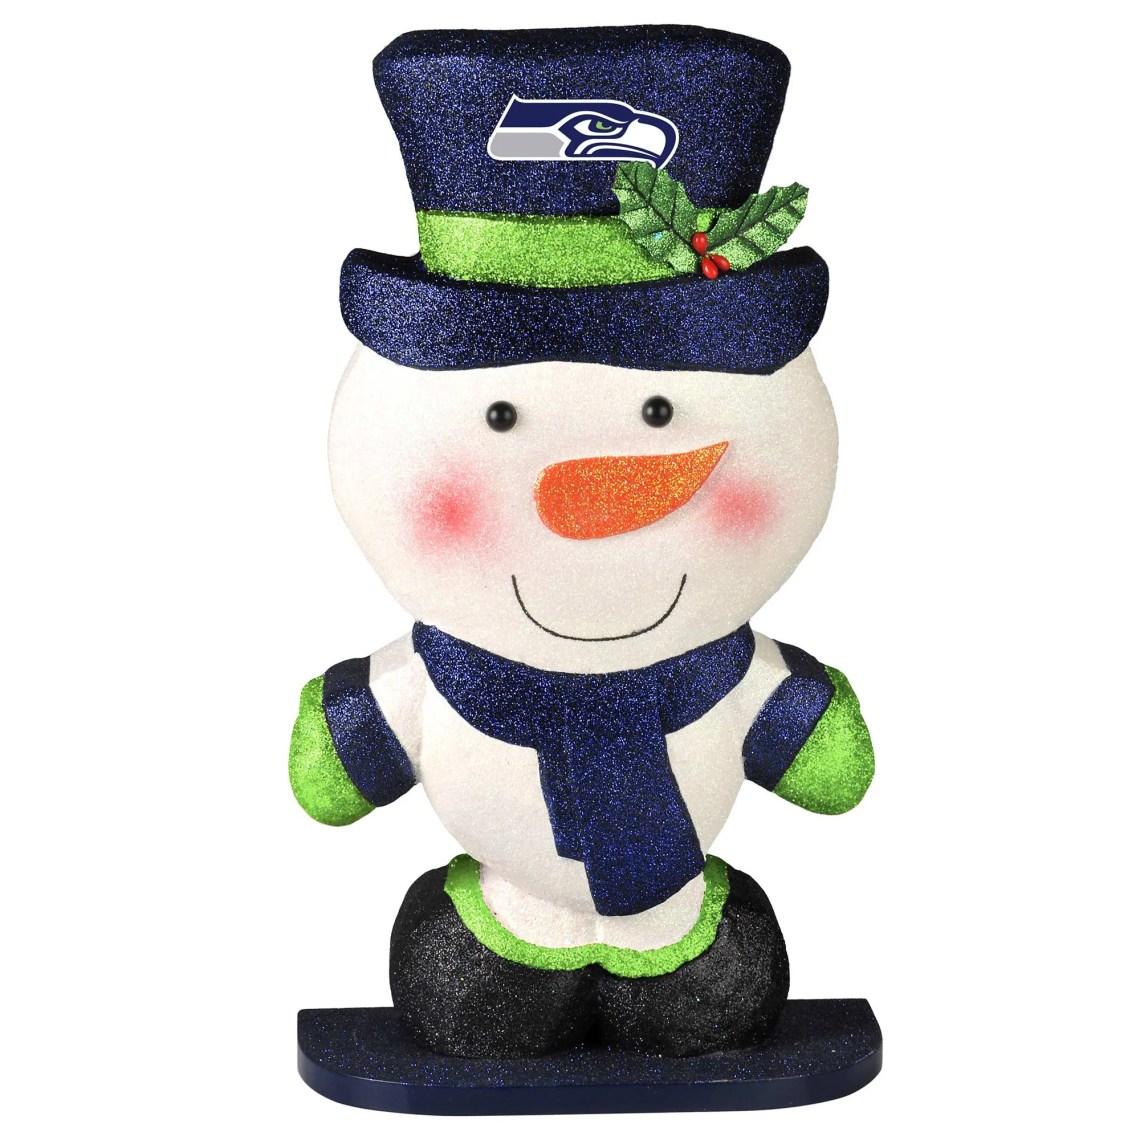 Seattle Seahawks Polystyrene Snowman Figurine